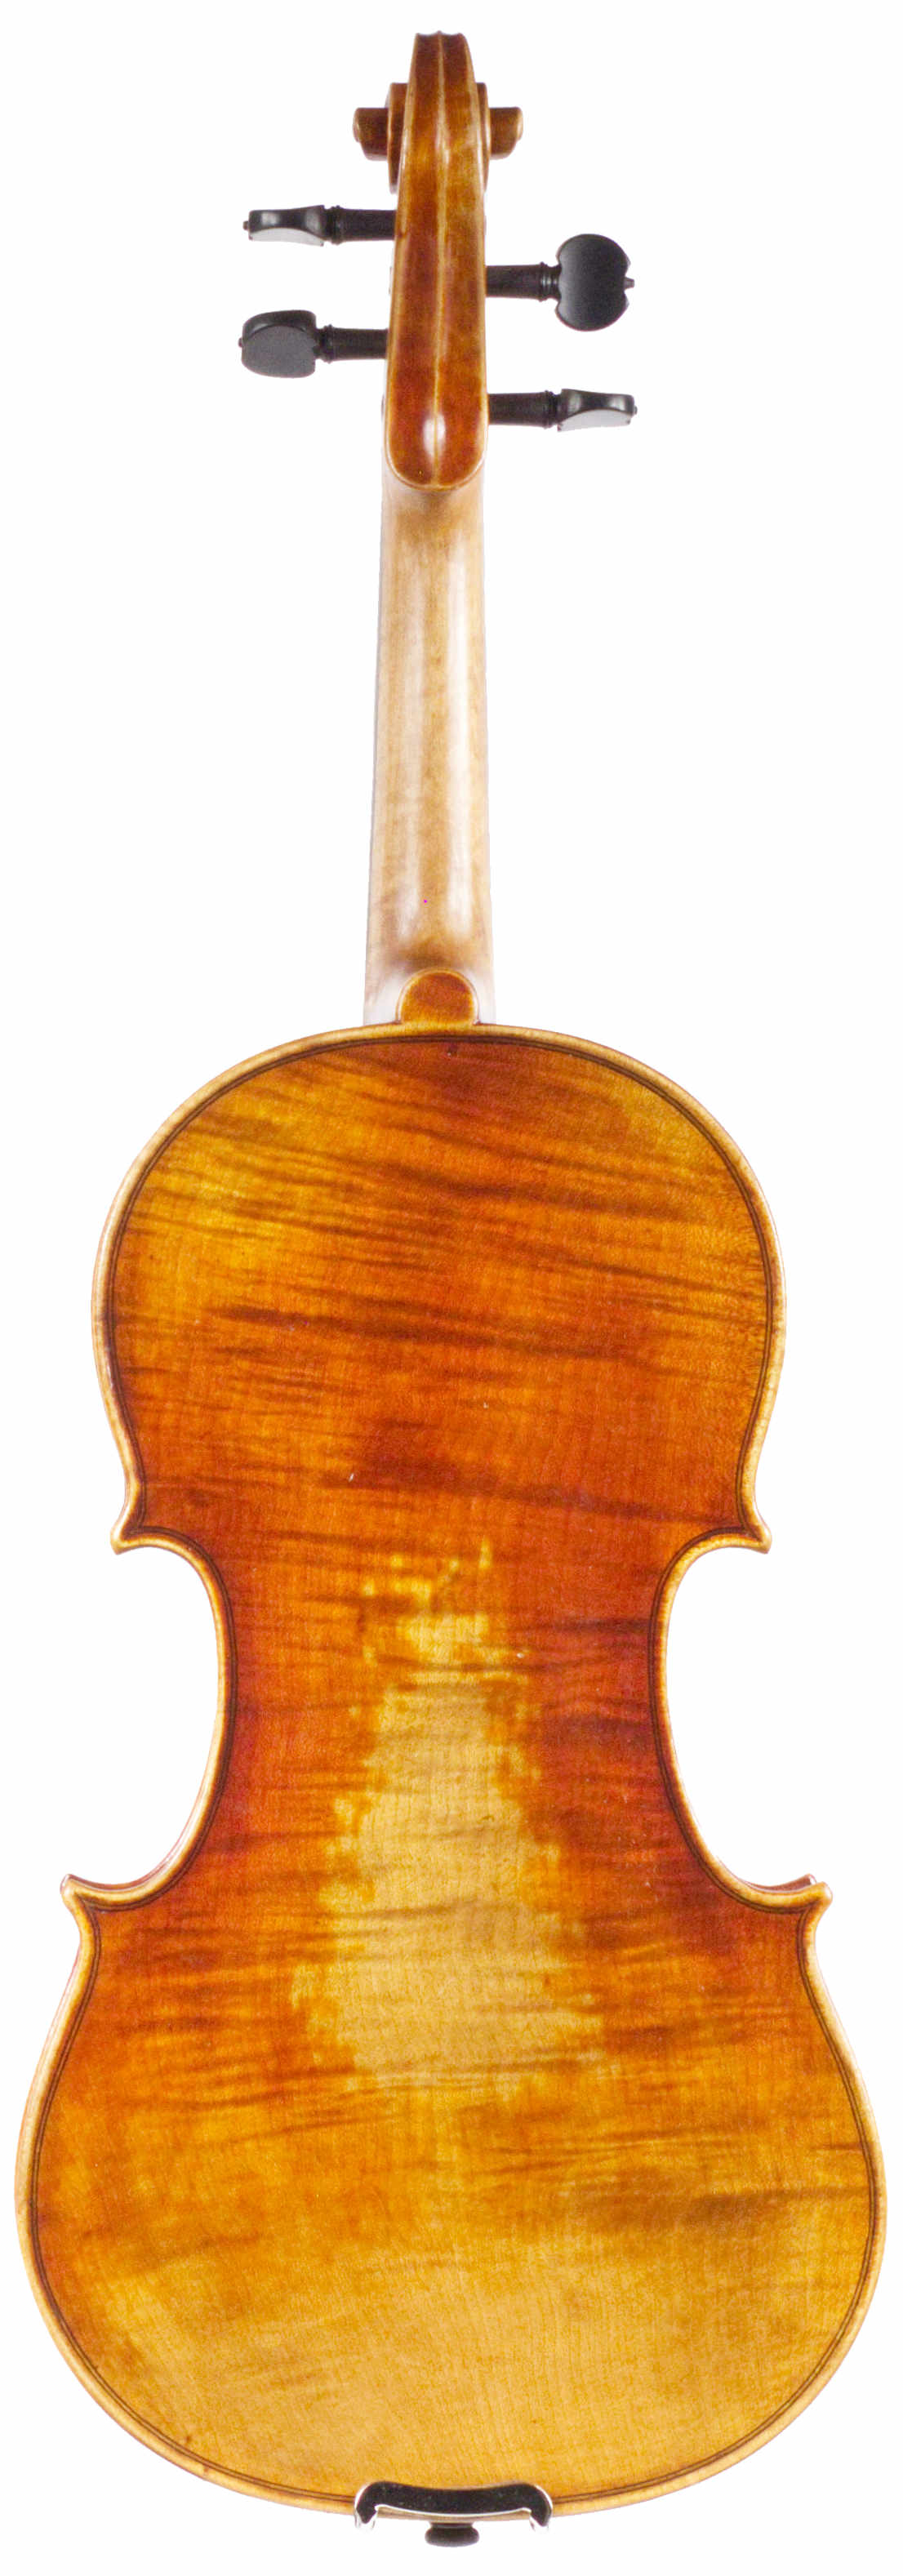 Jay Haide Strad violin